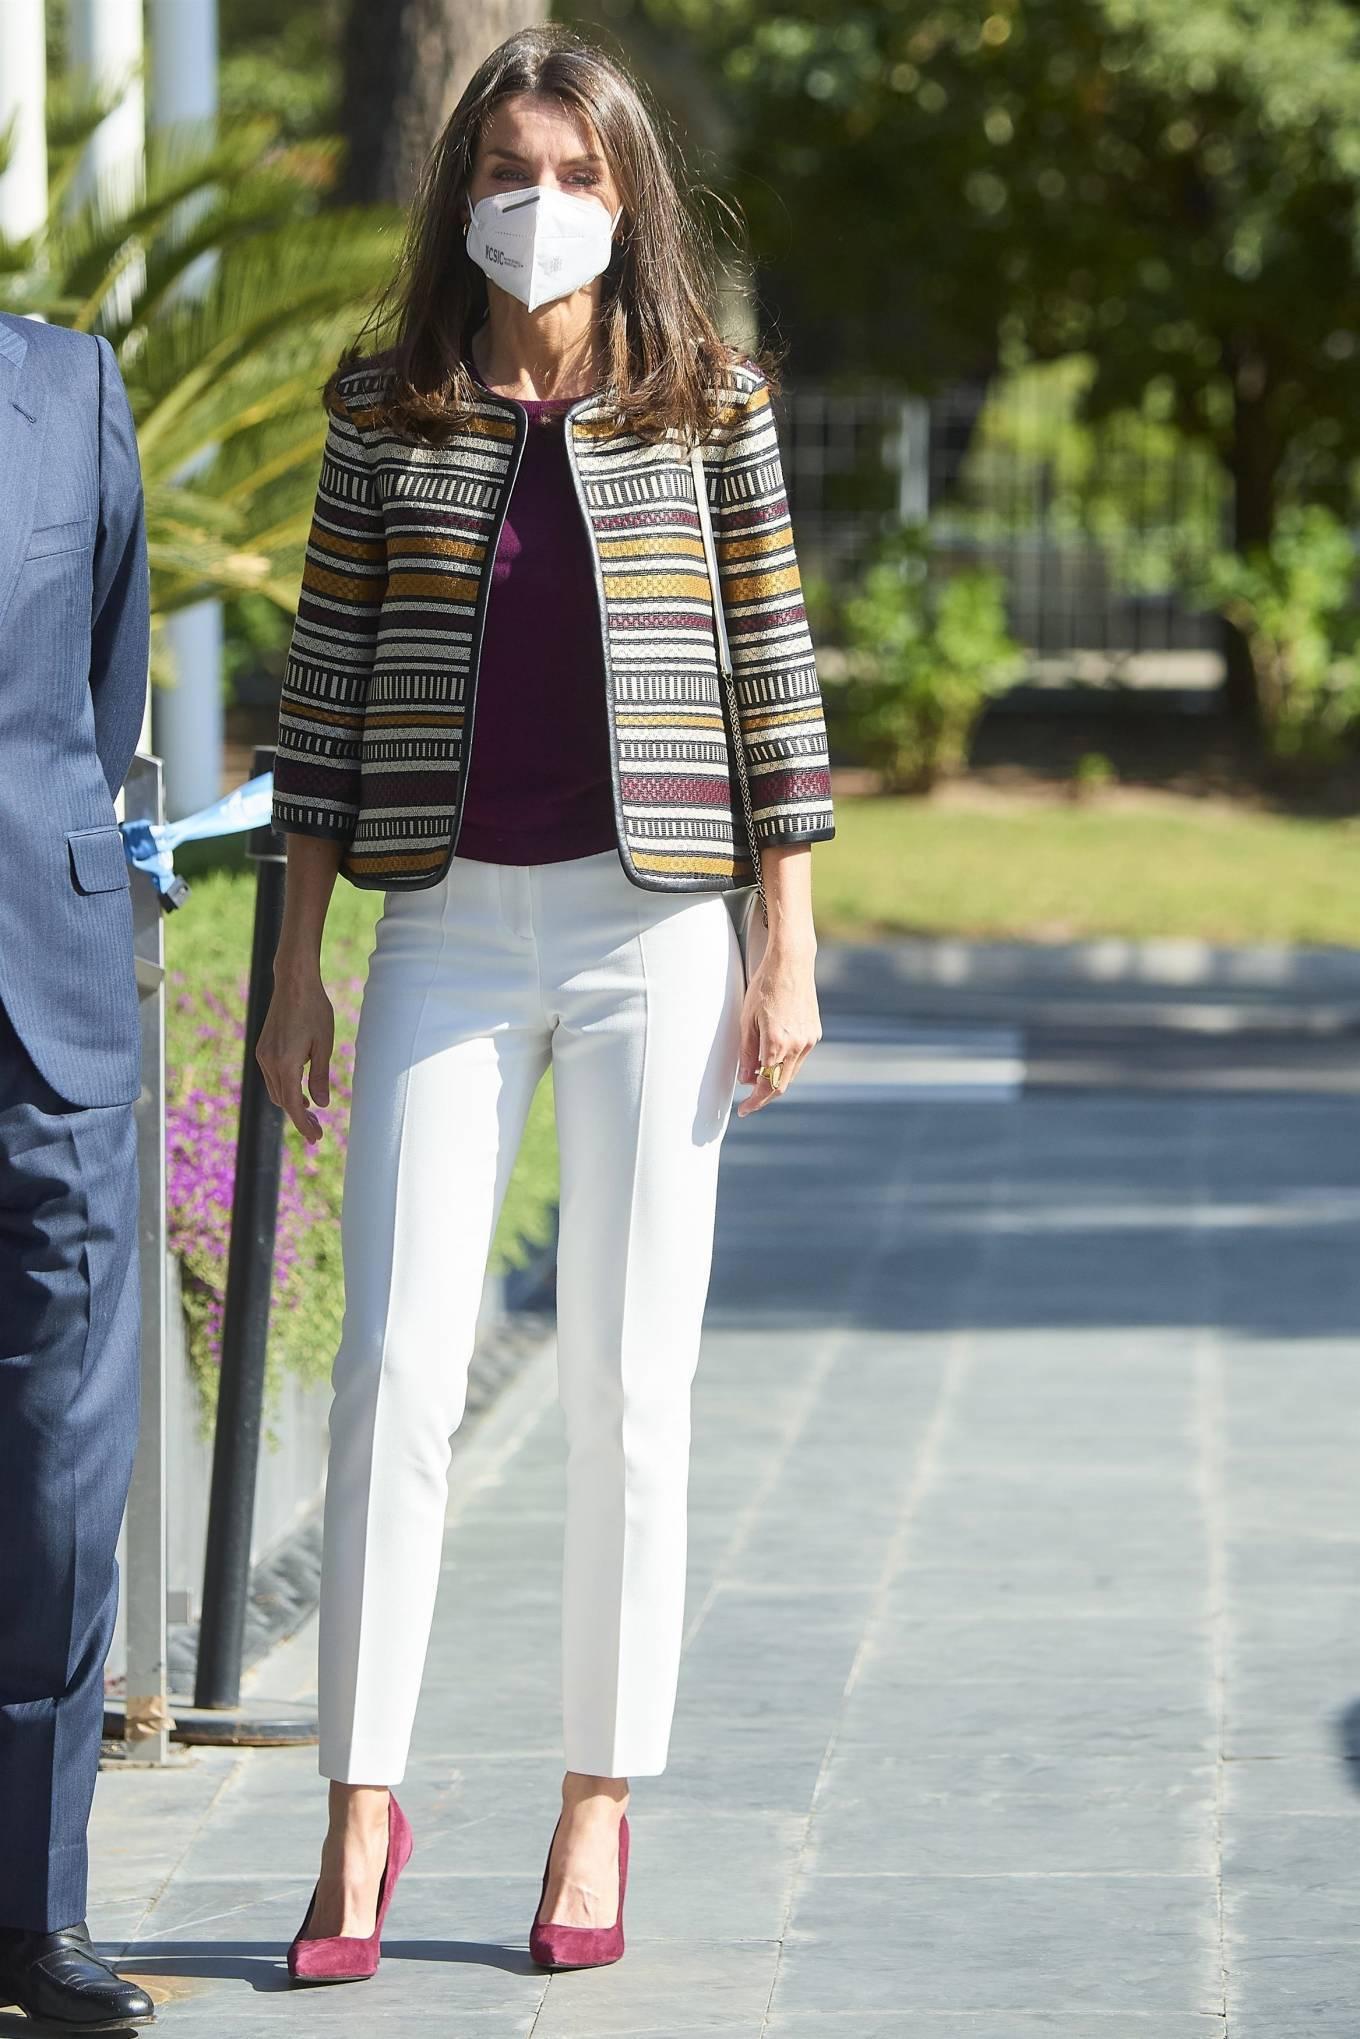 Queen Letizia of Spain - Seen at Mutua Madrilena Foundation Headquarters in Madrid